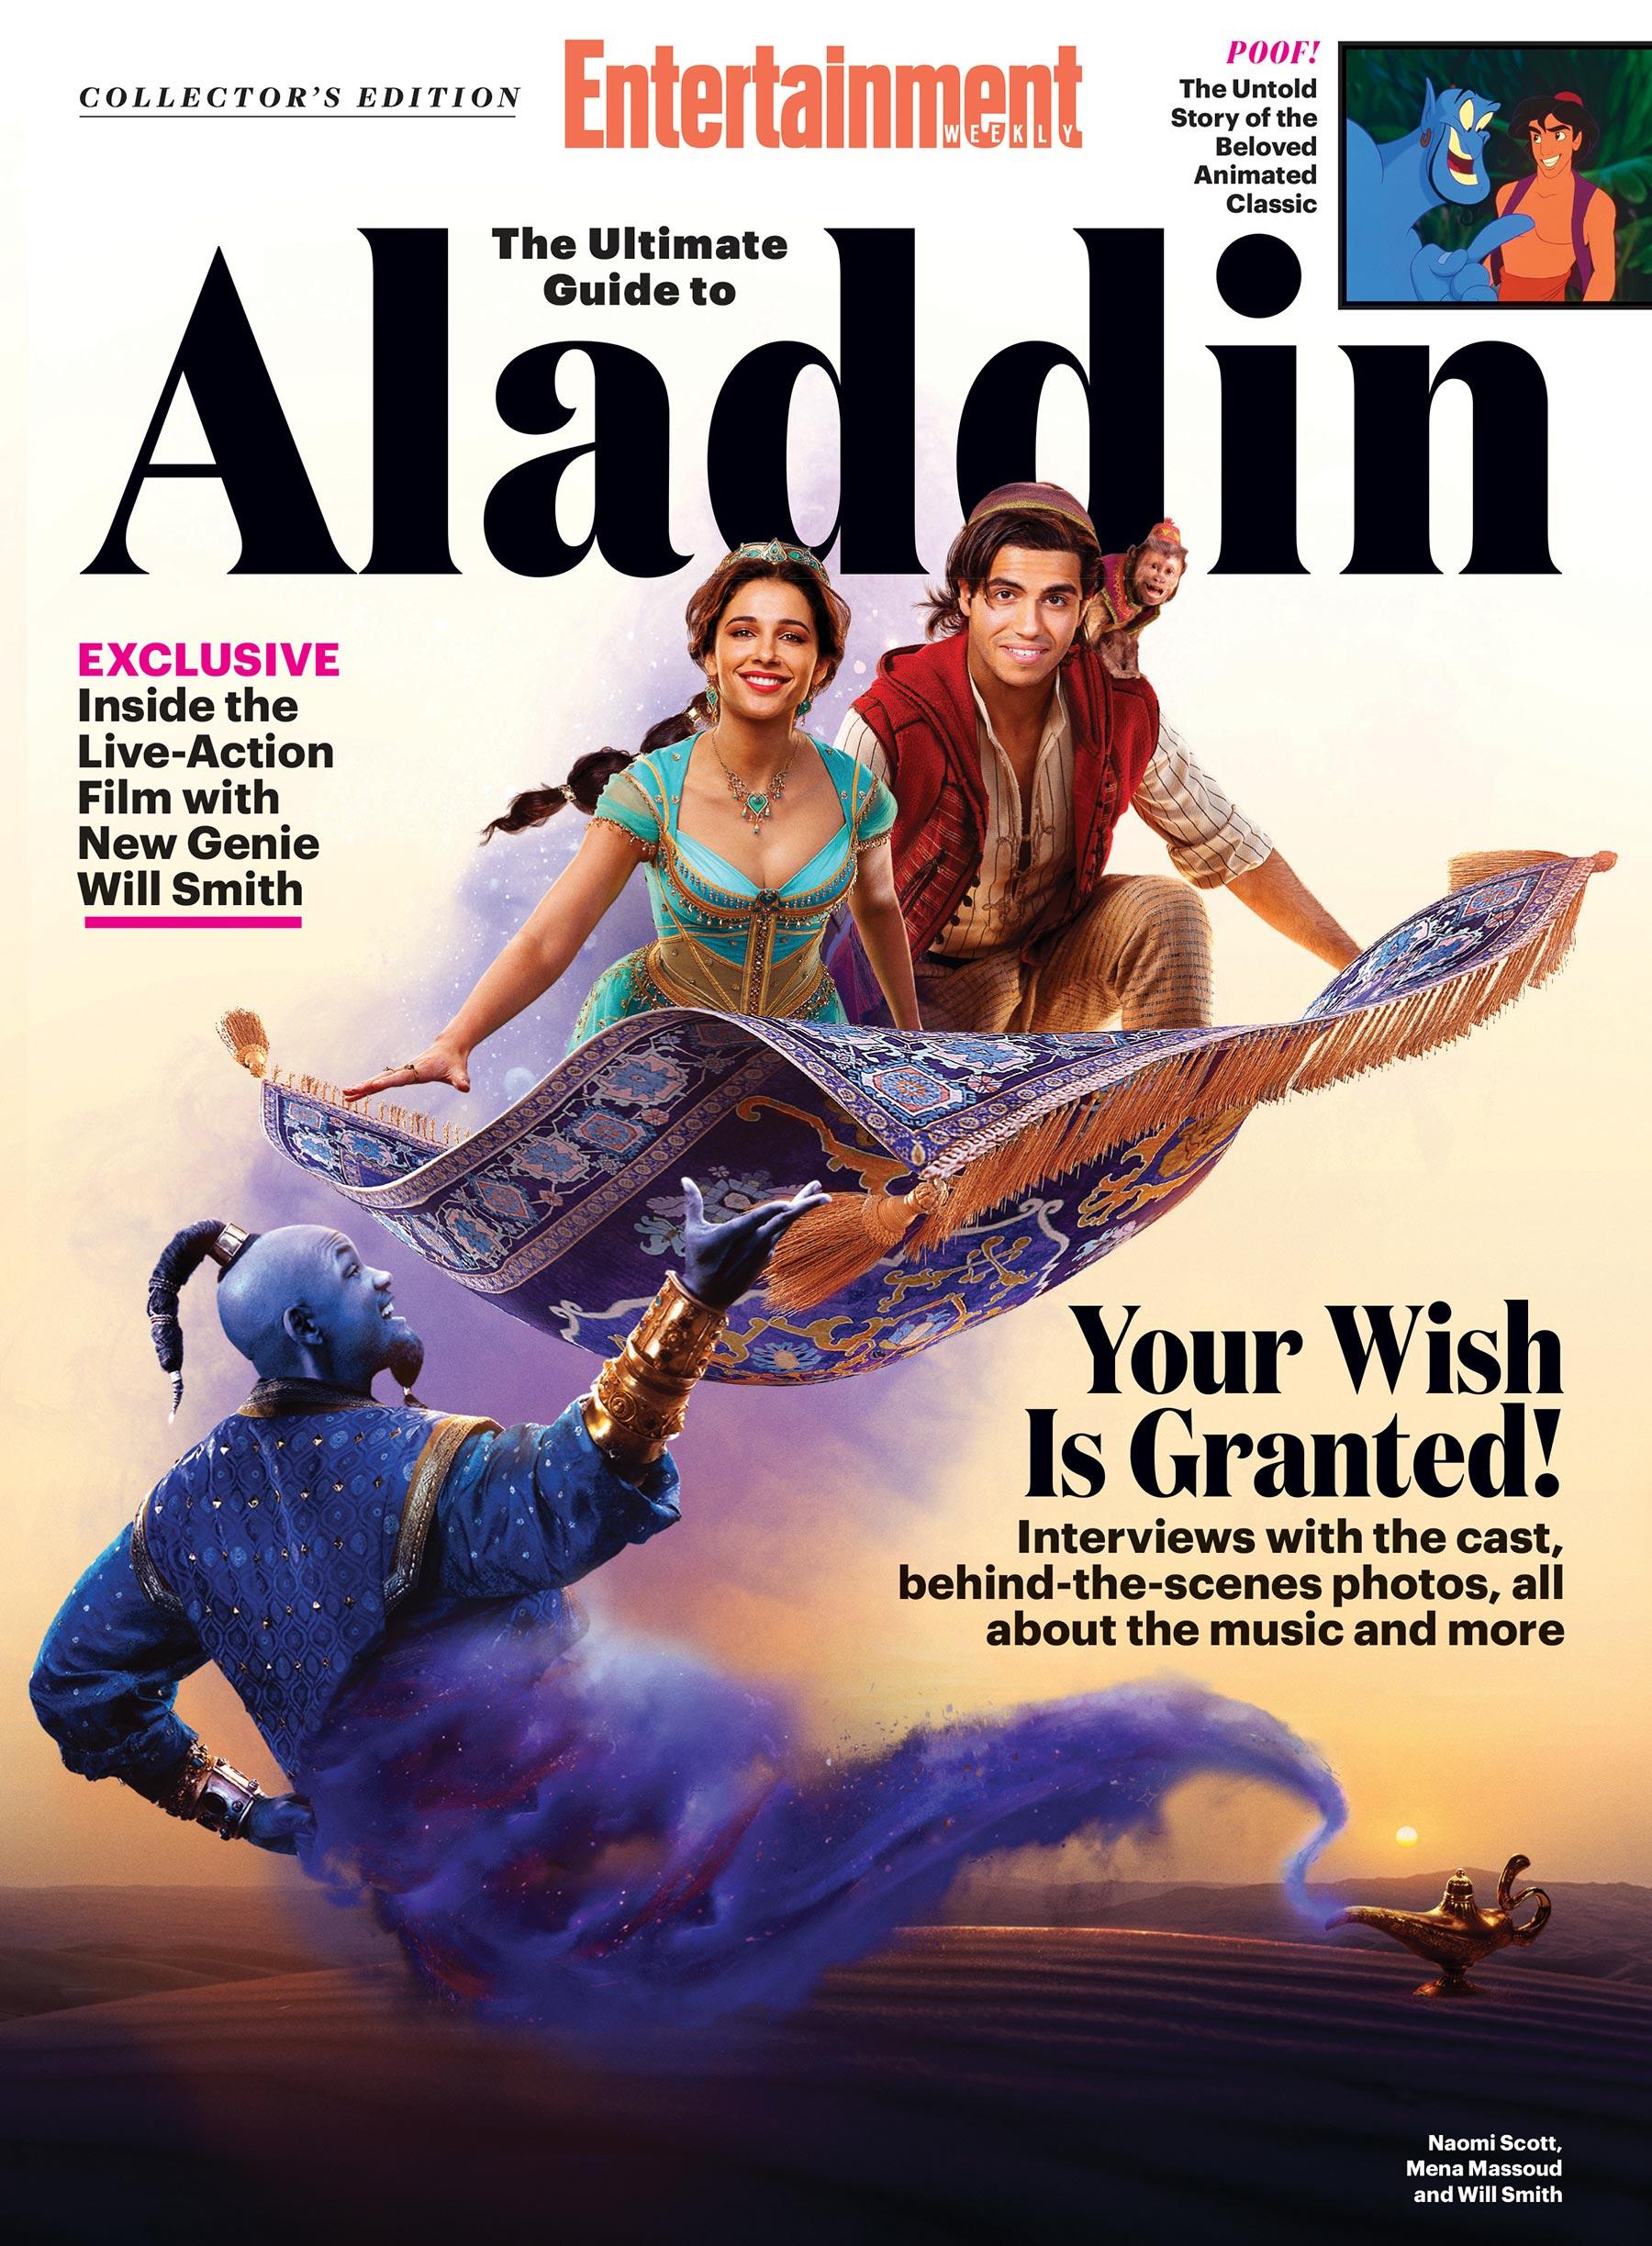 ew_aladdin_cover_front-1.jpg